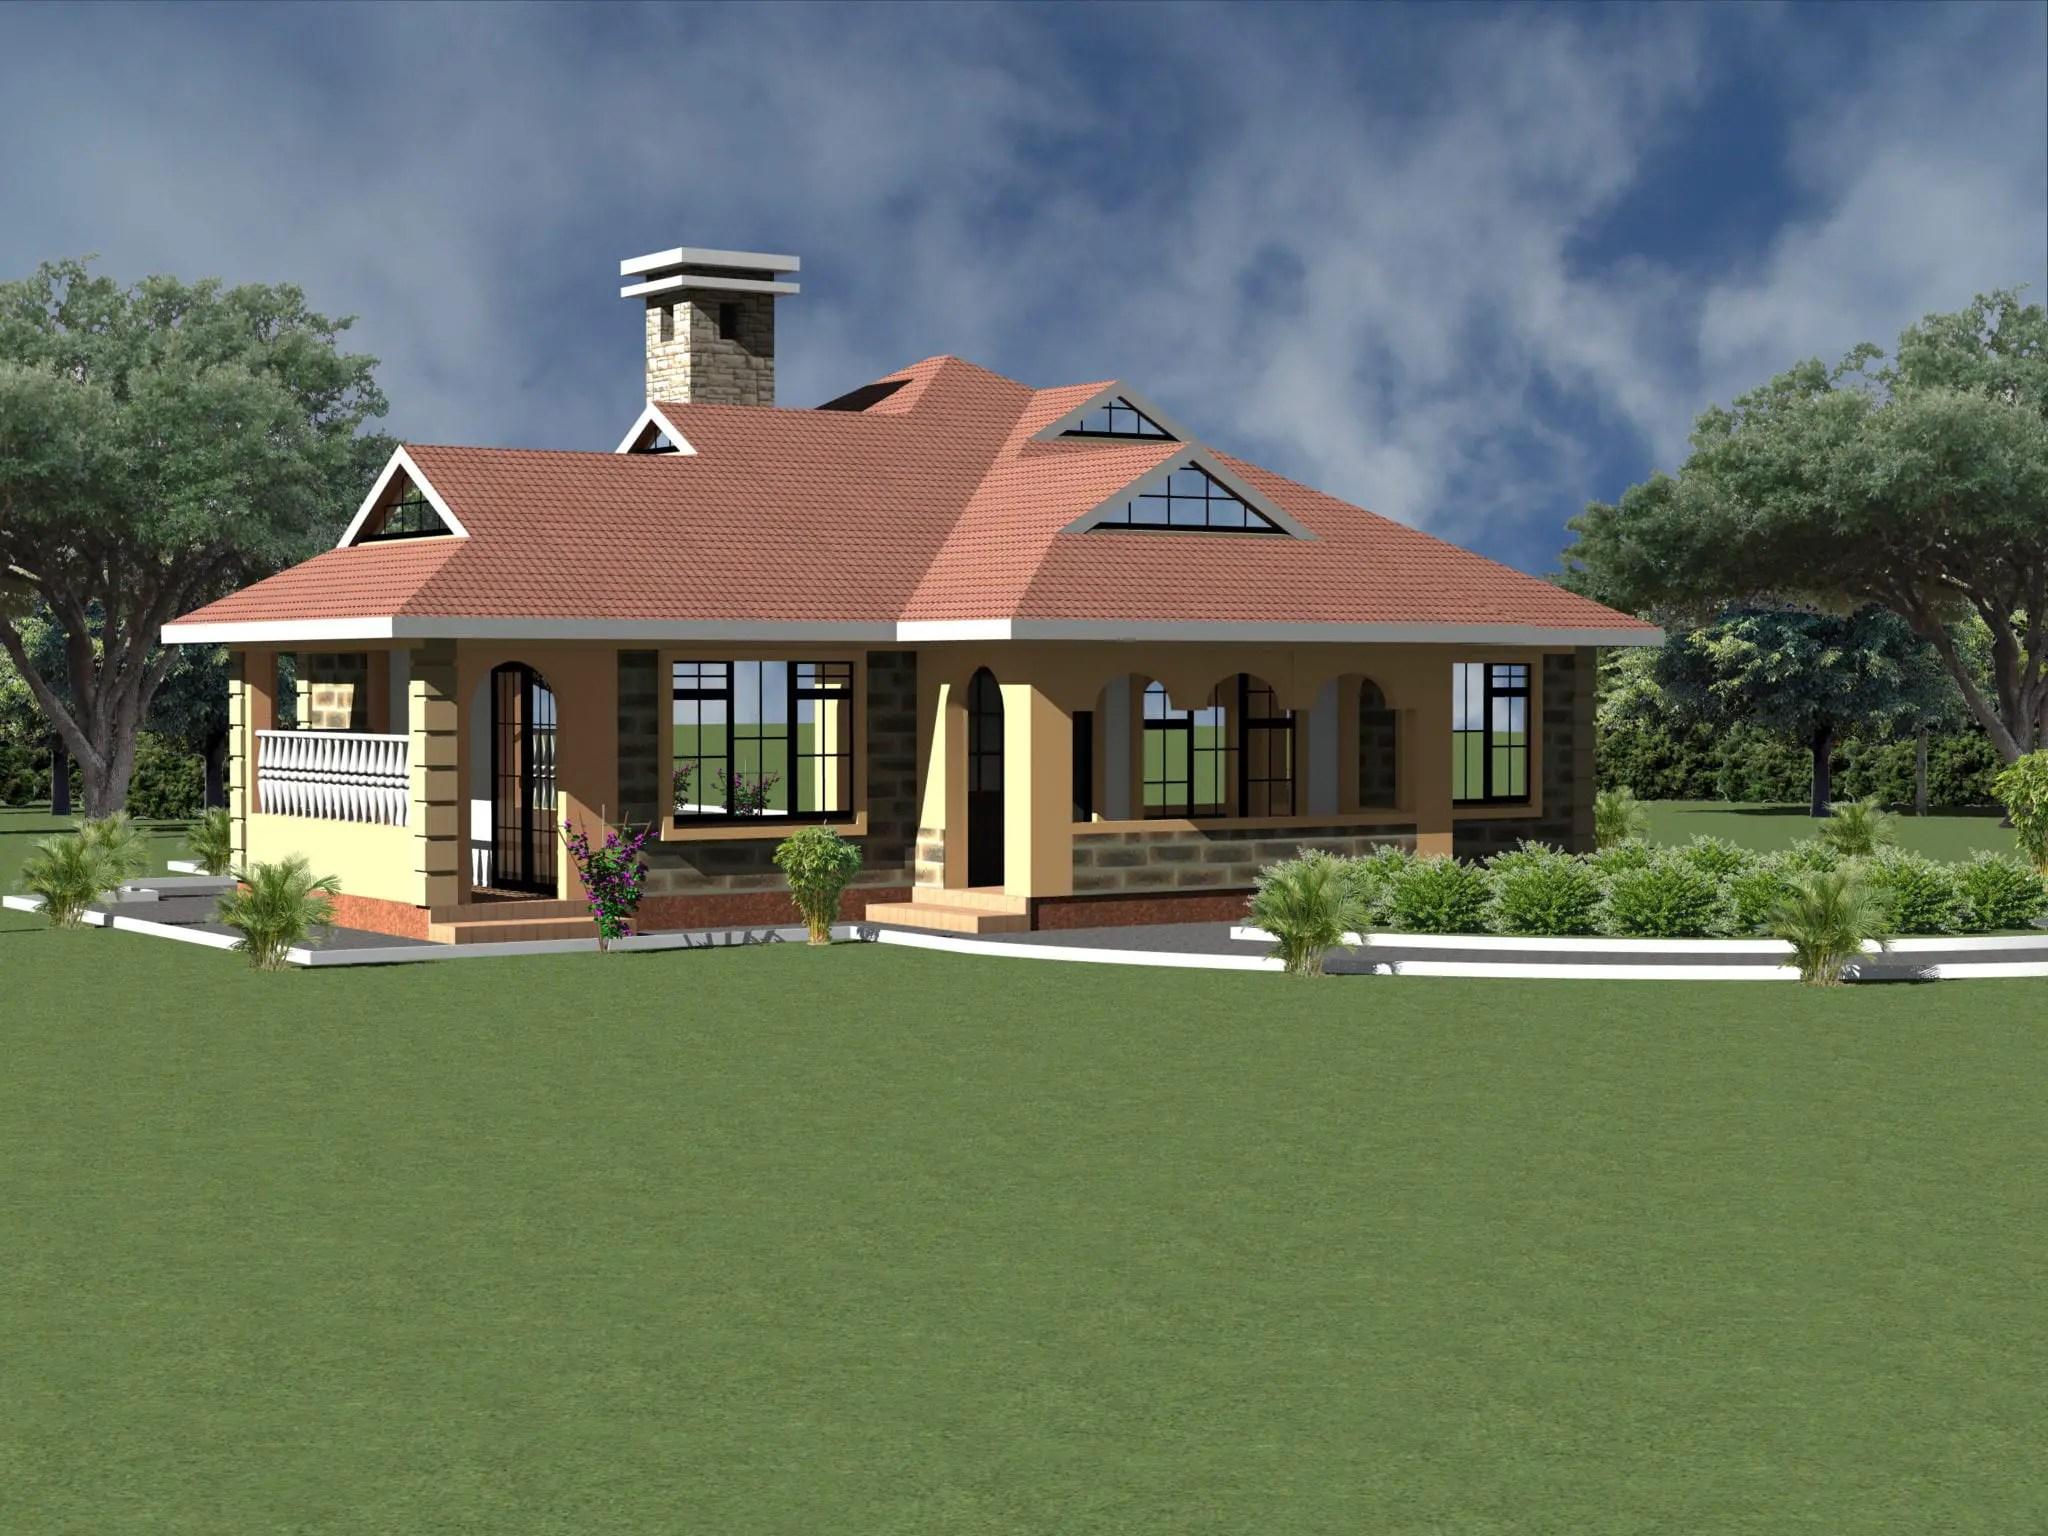 Simple 4 Bedroom Bungalow House Plans Novocom Top